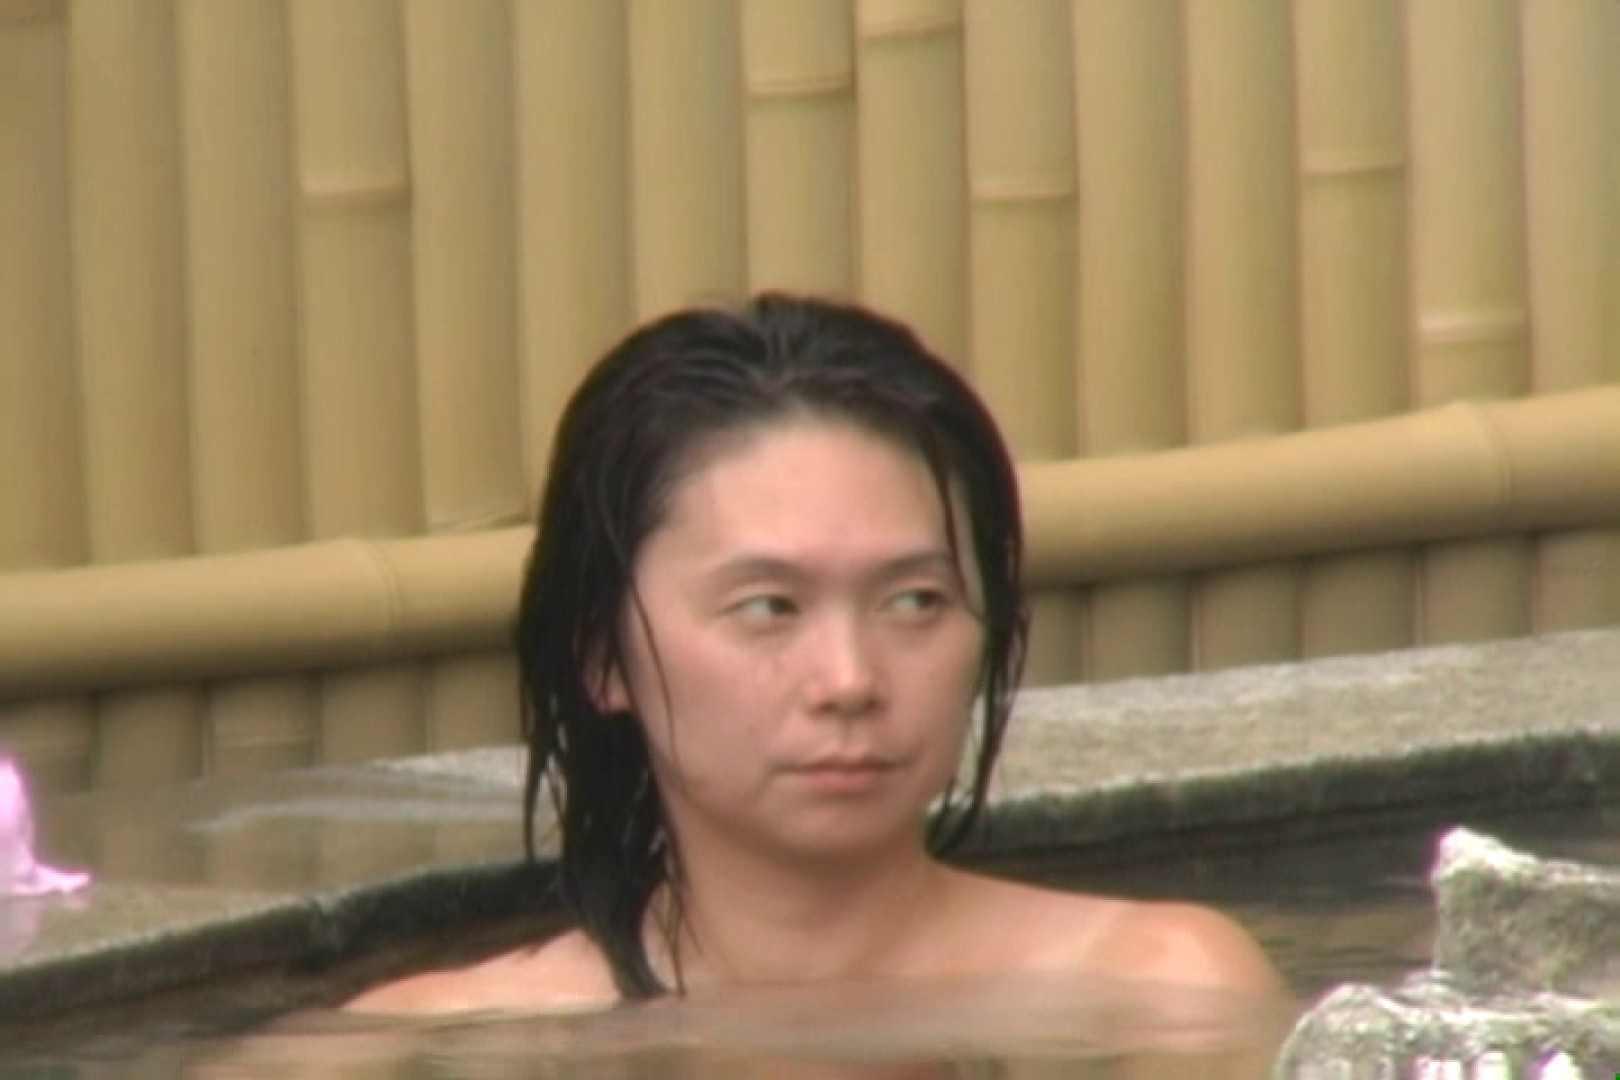 Aquaな露天風呂Vol.619 HなOL オマンコ動画キャプチャ 107pic 2